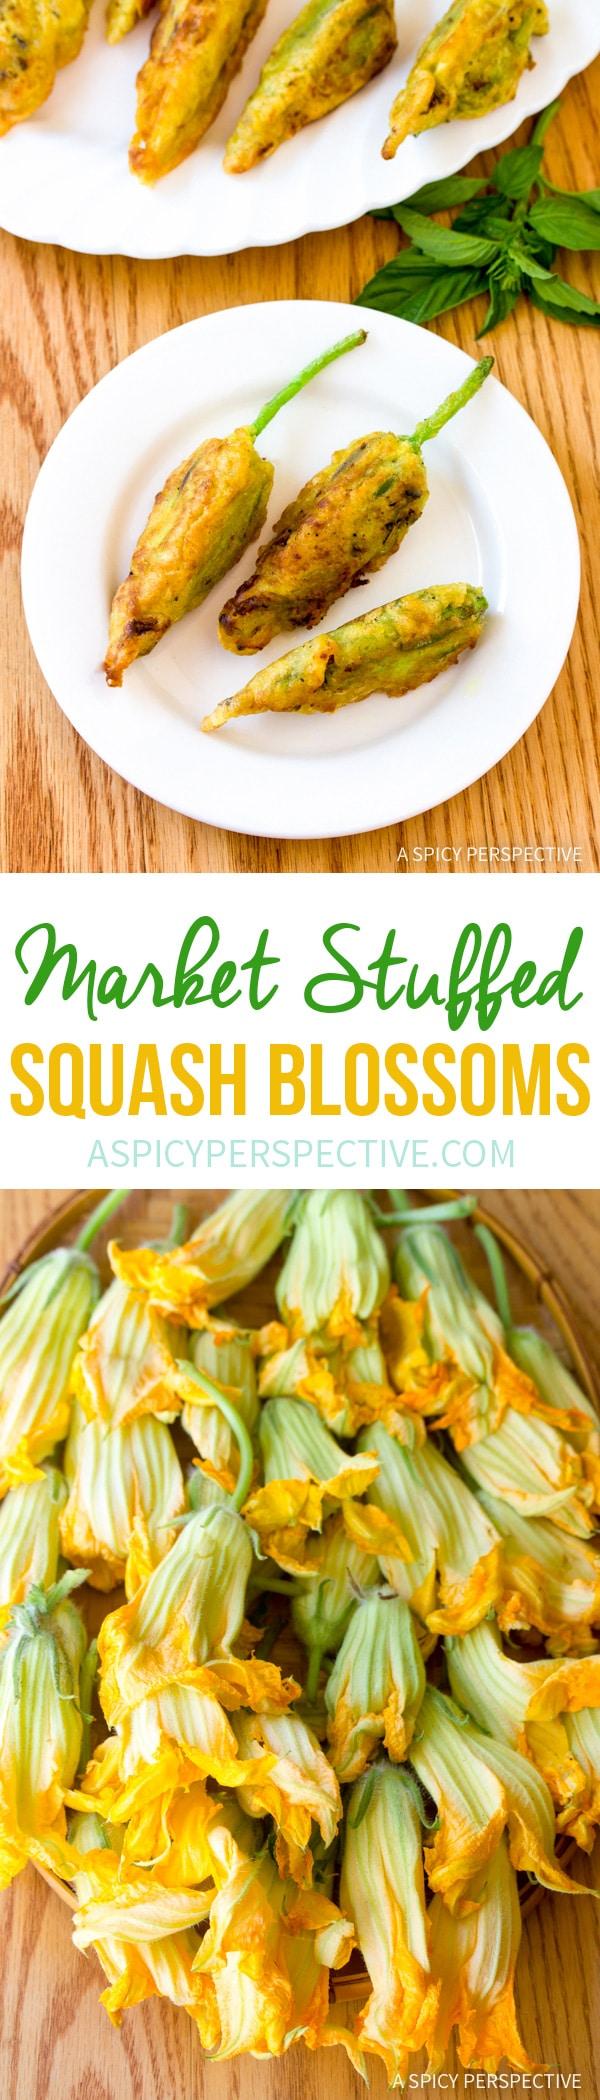 Fresh Market Stuffed Squash Blossoms Recipe